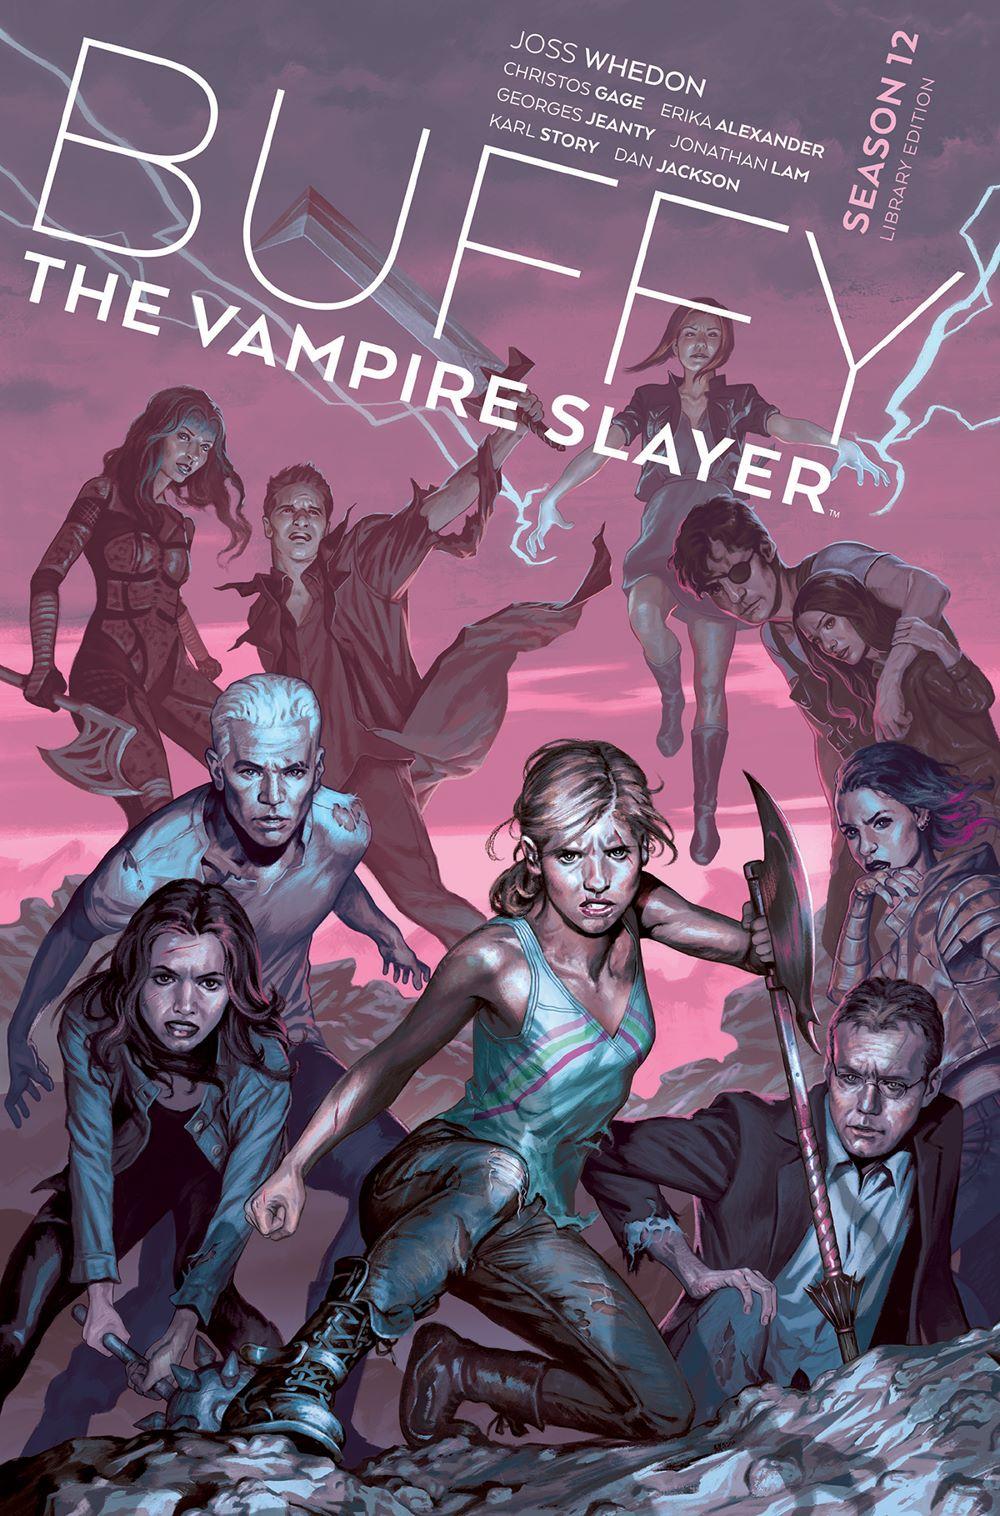 Buffy_Season12_HC_Cover ComicList Previews: BUFFY THE VAMPIRE SLAYER SEASON 12 LIBRARY EDITION VOLUME 1 HC